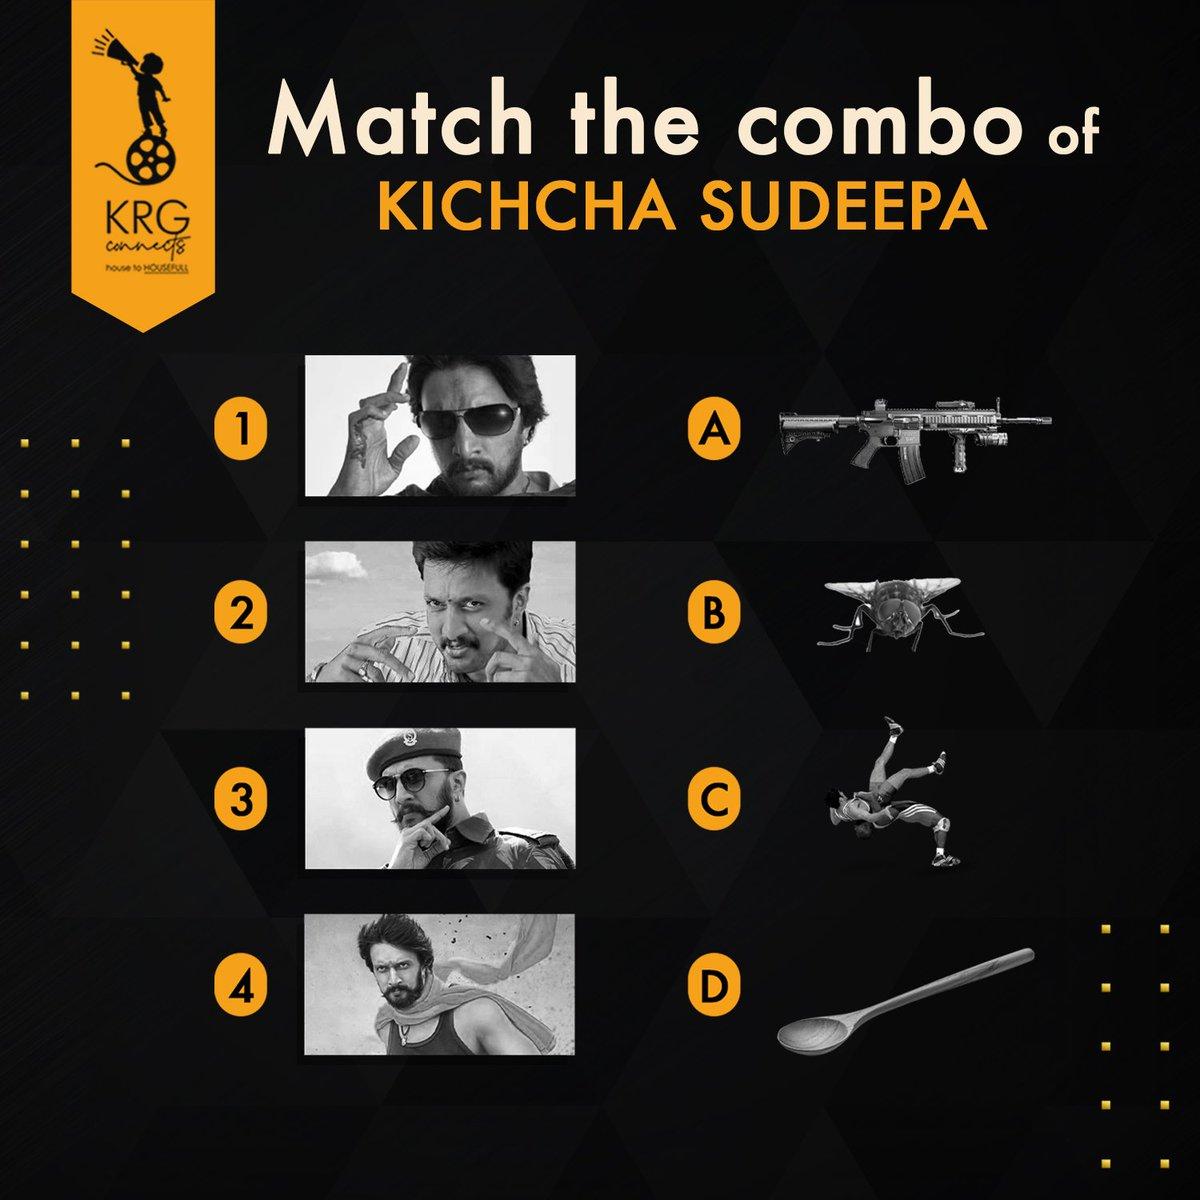 Match the combo right to prove that you are true #Sudeepian  . #Sundayfunday with  ❤️ @KicchaSudeep ❤️ .  #Sundaymood #KicchaSudeepa #KichchaSudeep #kicchasudeep #Sudeepians #Phantom #kicchafans #abhinayachakravarthy #kicchabirthday #KrgStudios #KrgConnects #HouseToHOUSEFULL https://t.co/GS5SvIhtfO